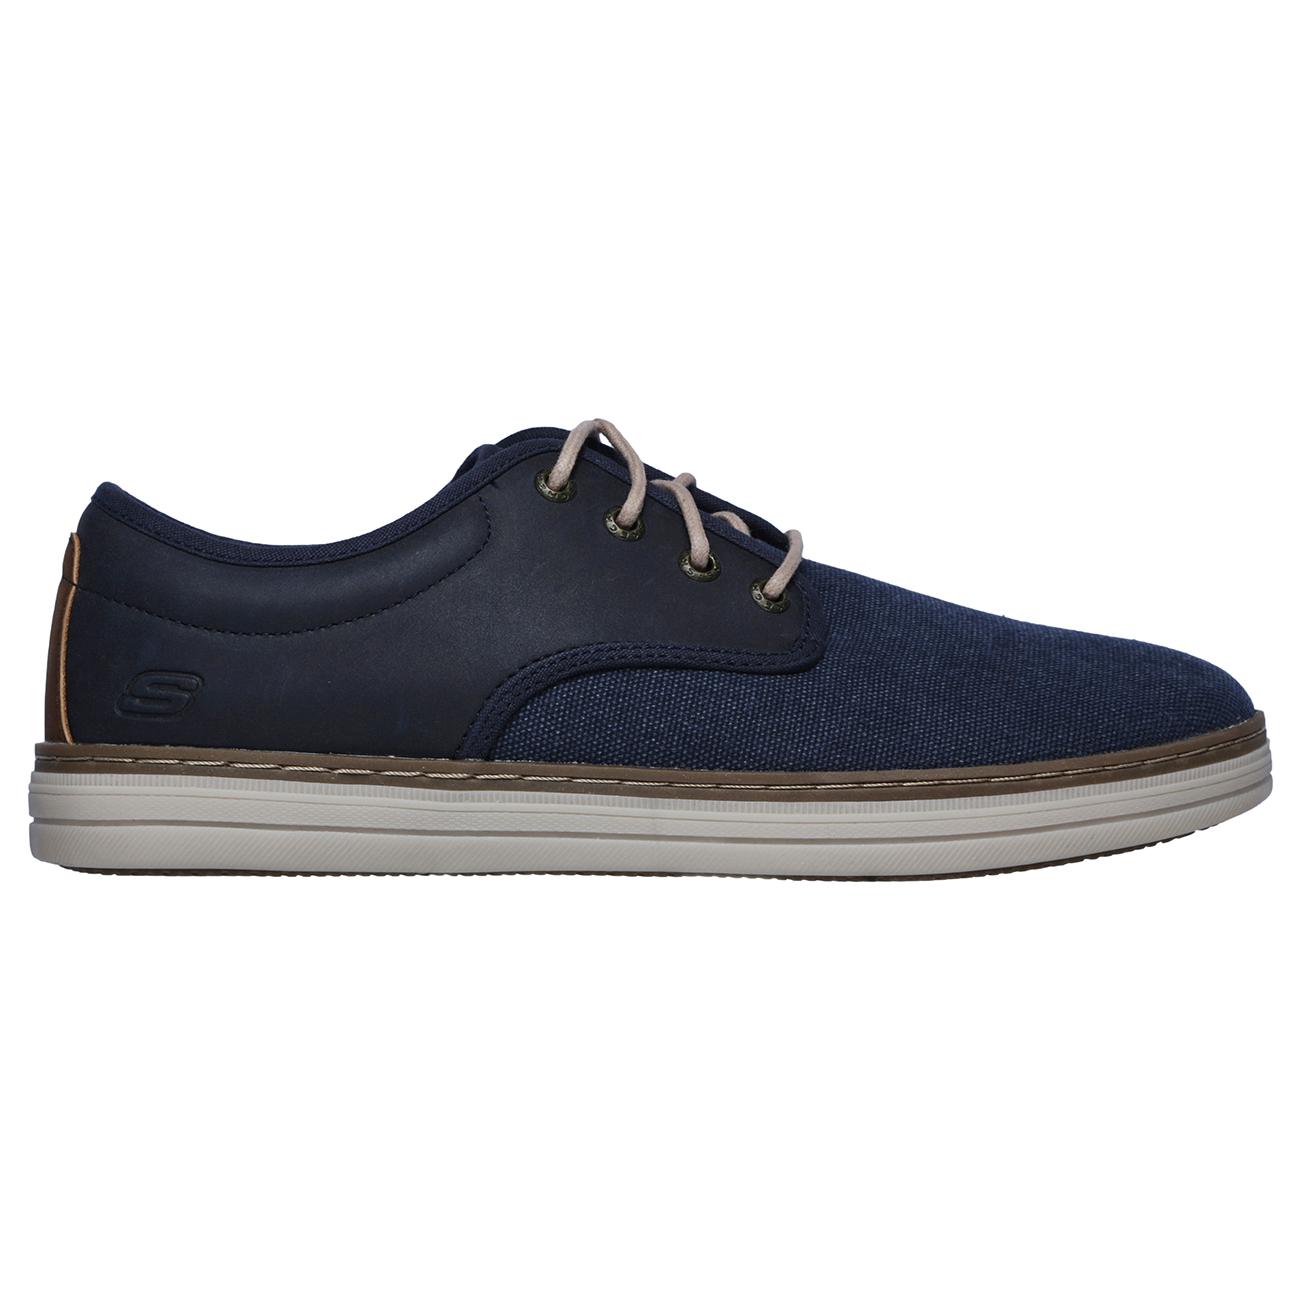 sketcher zapatos usa eu work